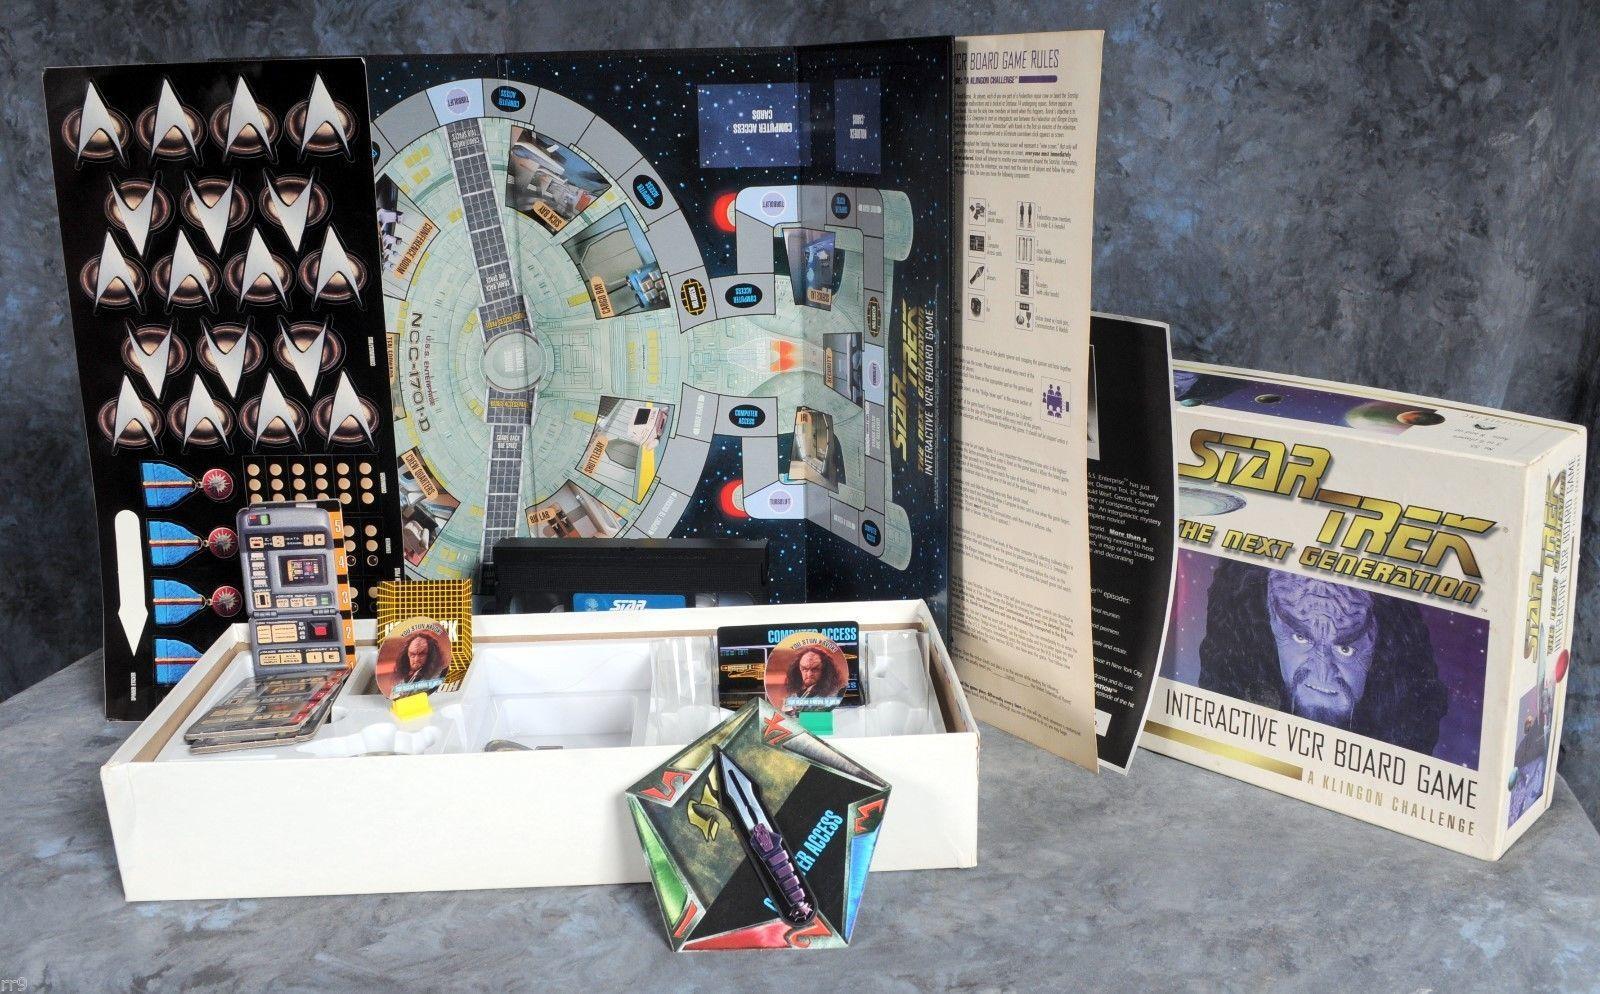 Star Trek The Next Generation Interactive VCR Board Game A Klingon Challenge